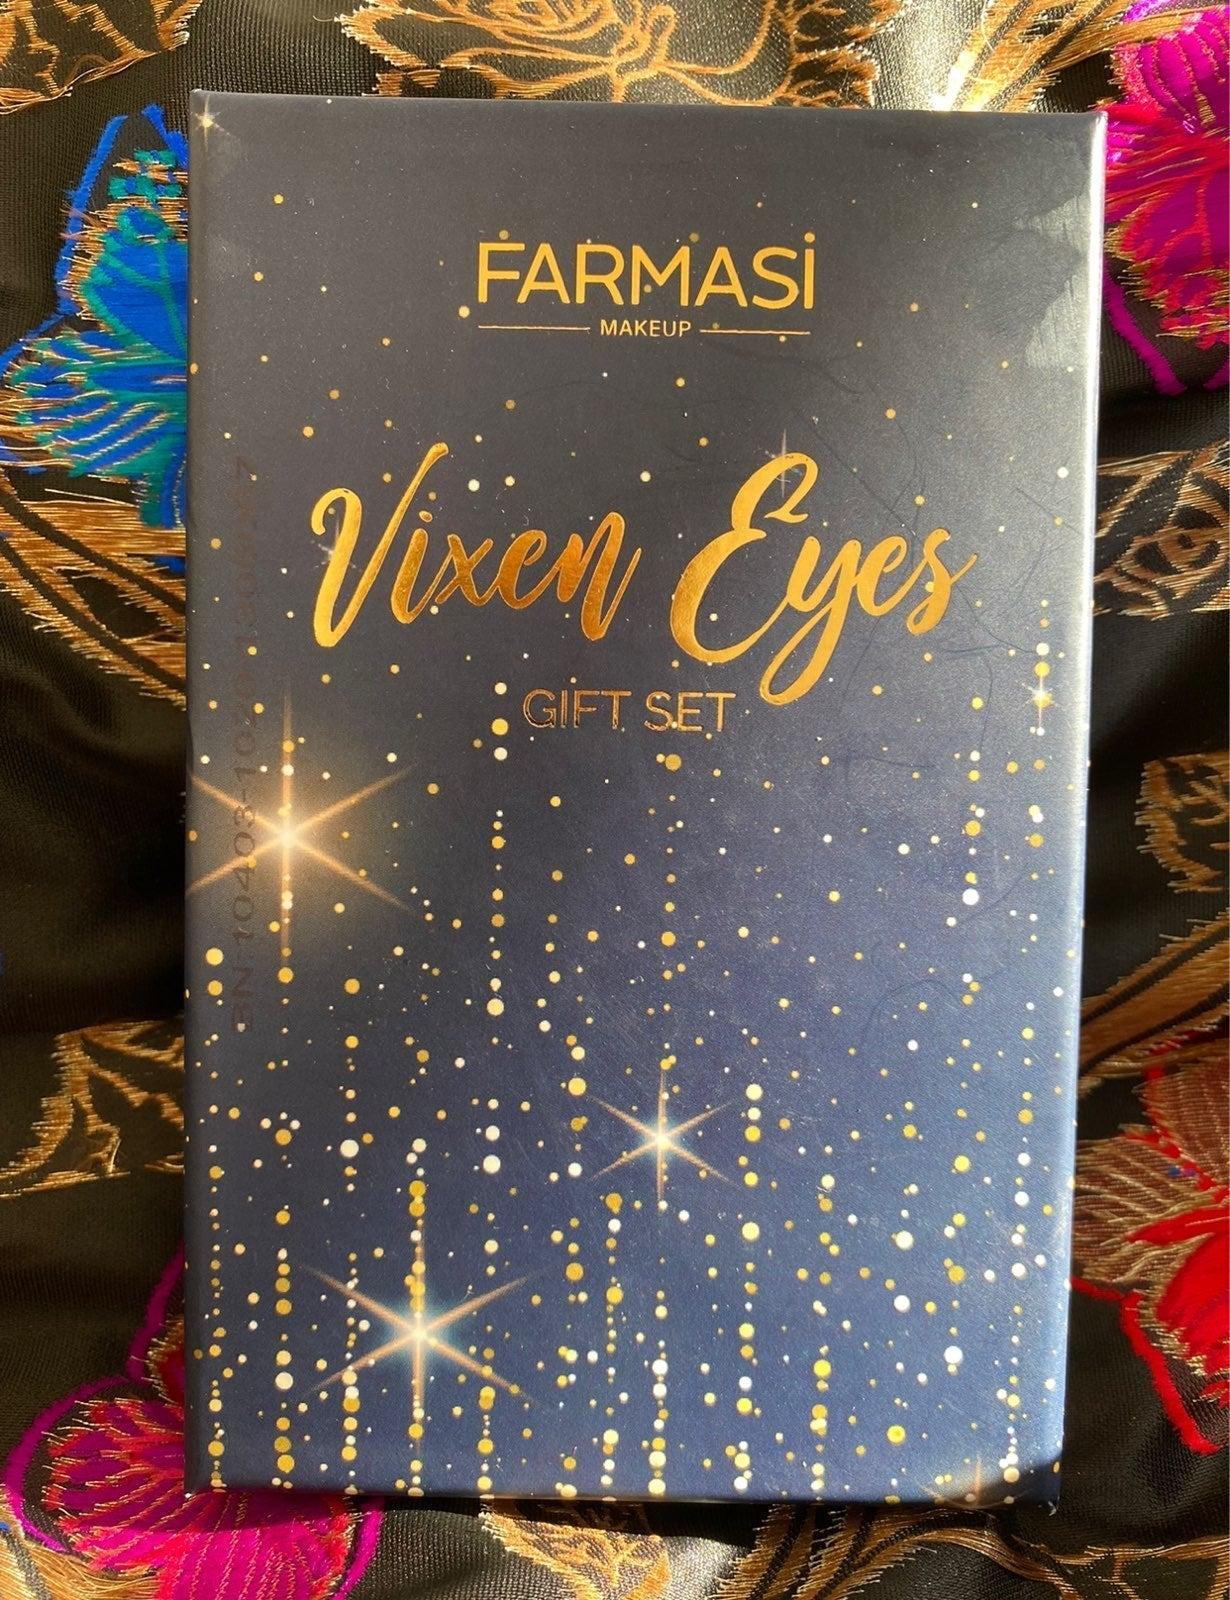 Vixen eyes gift set box